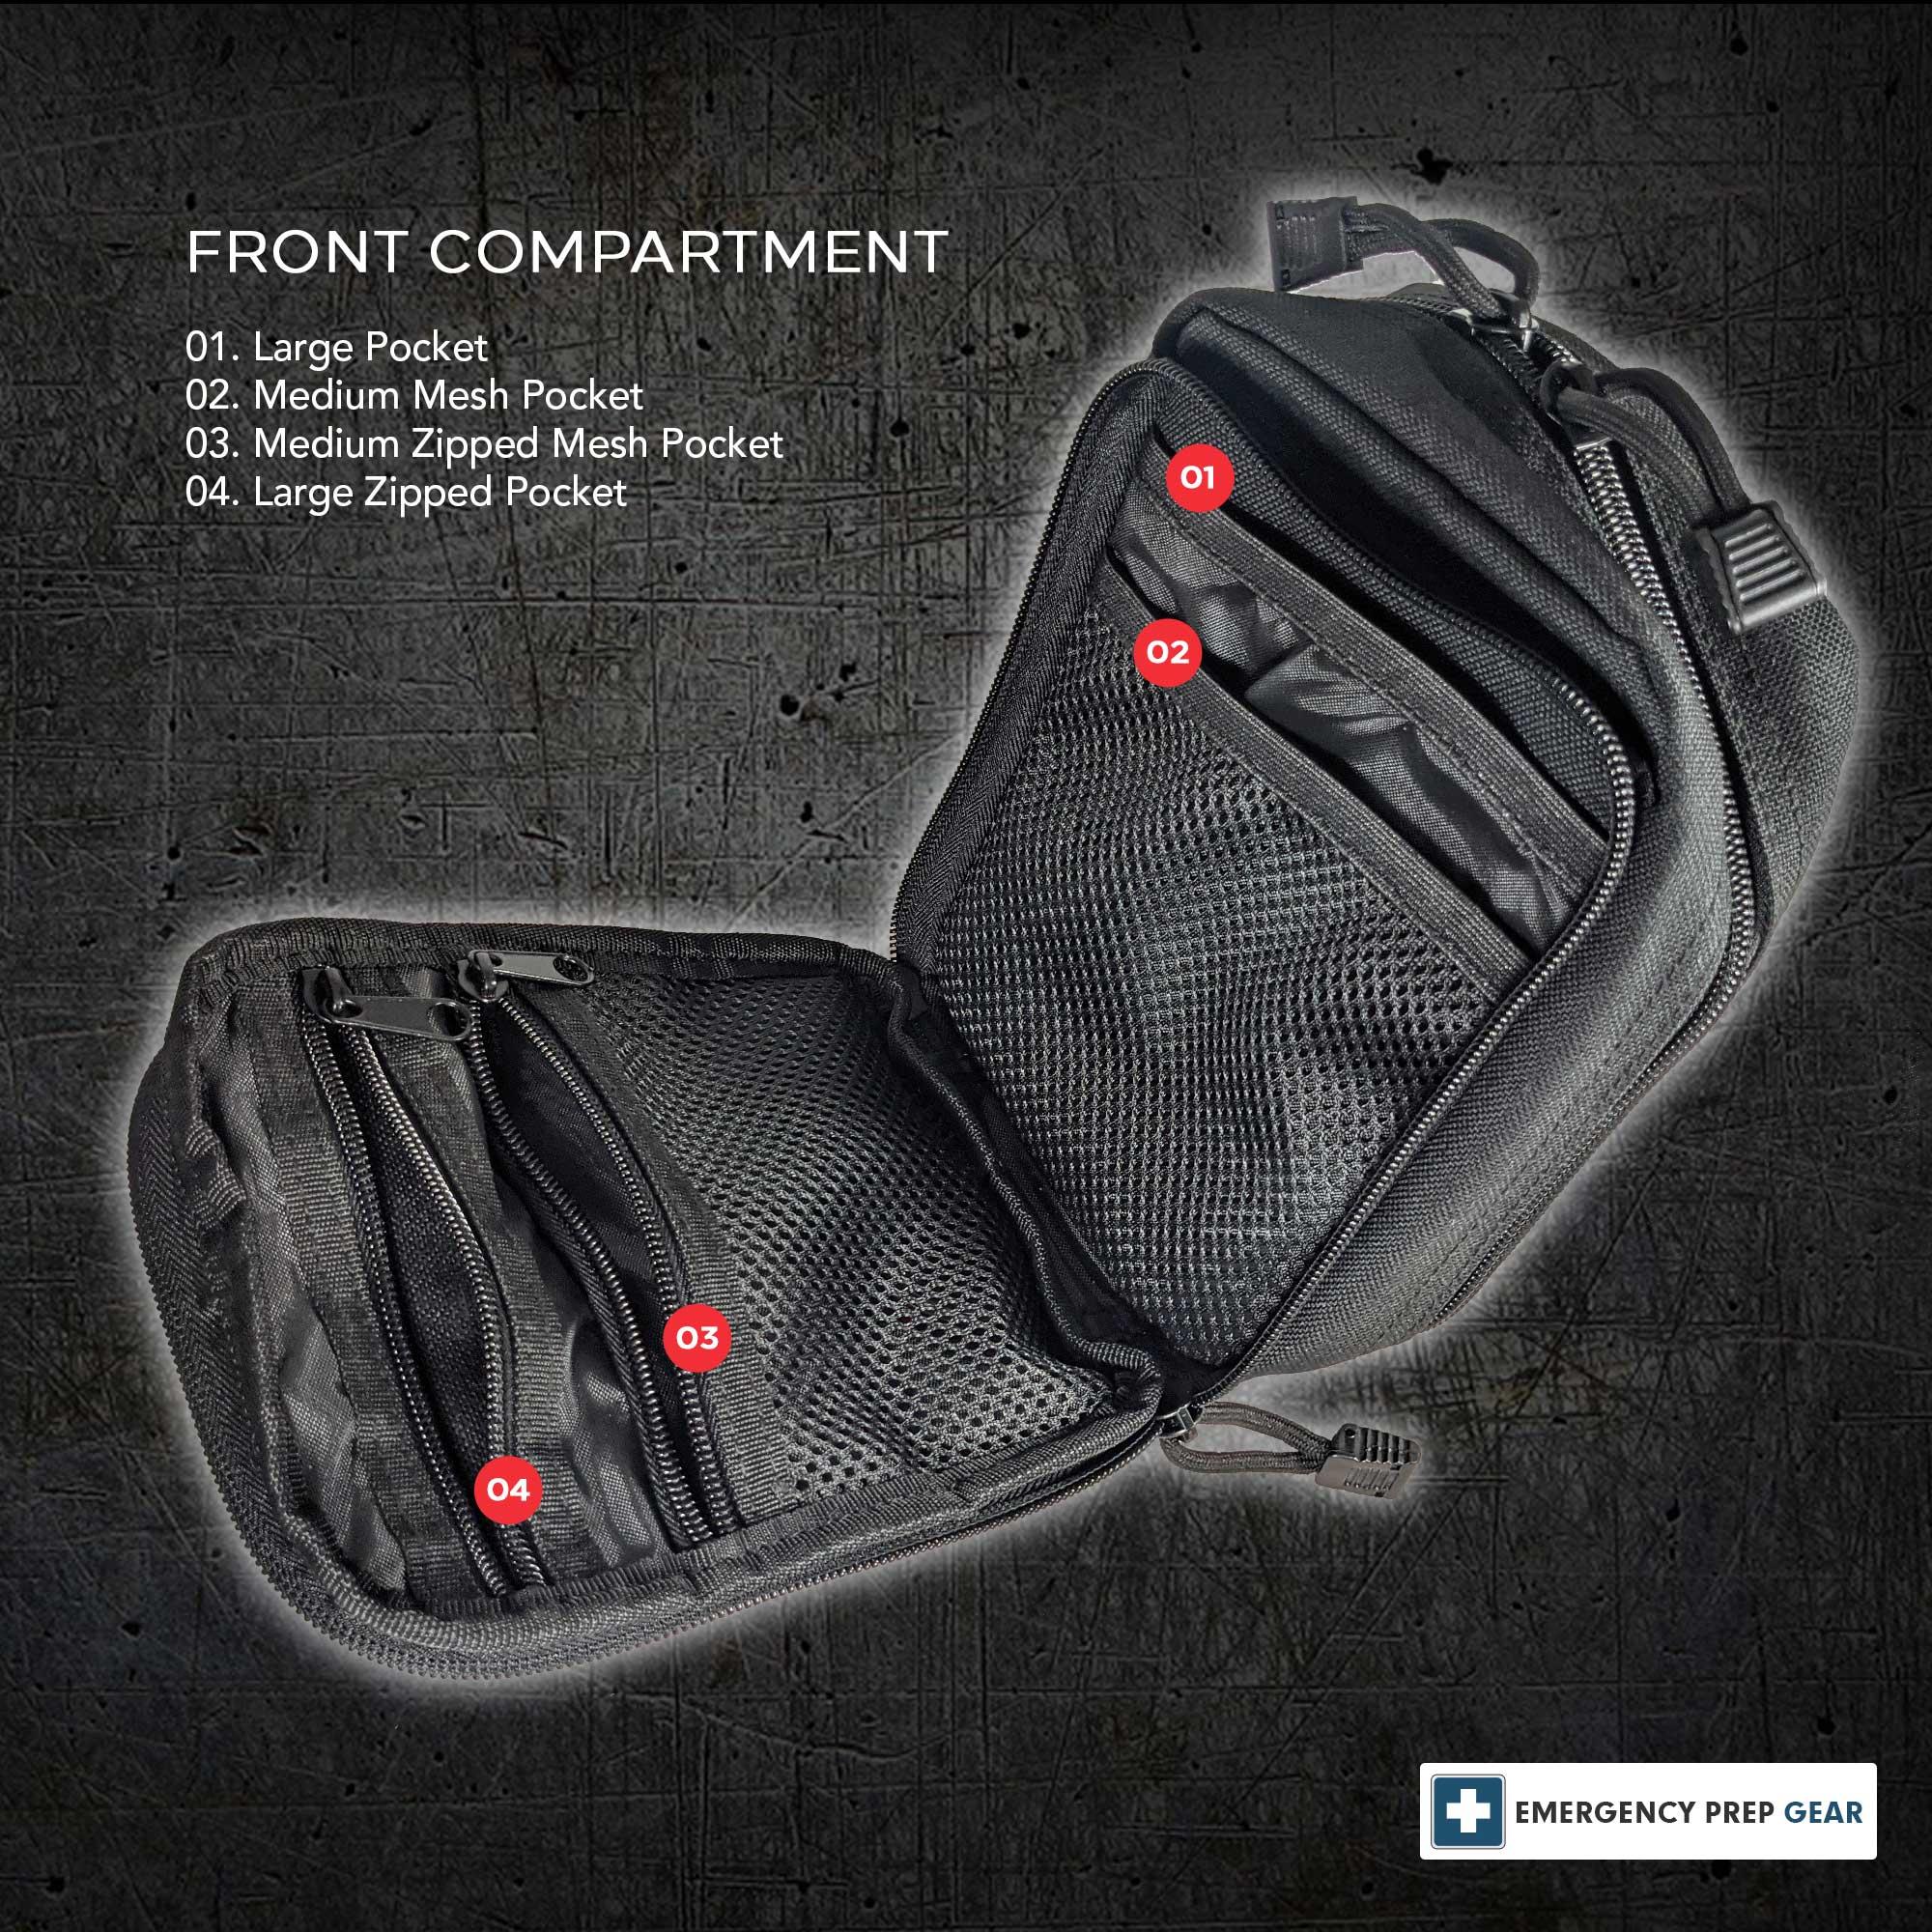 21 10 08 16 01 09 original b09dr49ctv epg gear compact black compartment2